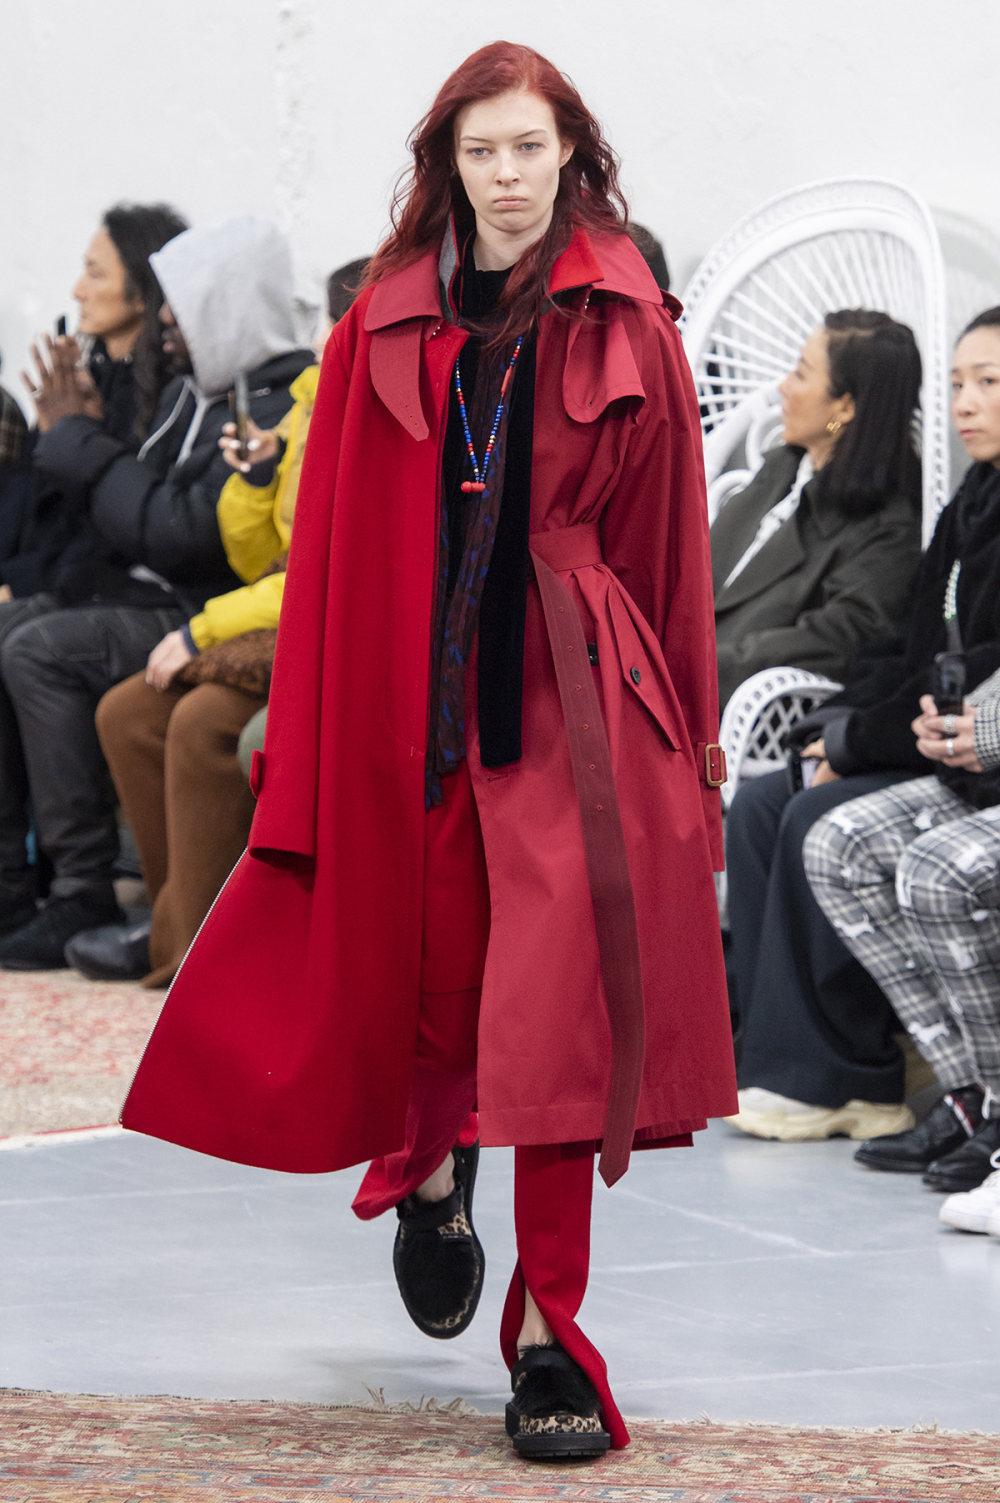 Sacai时装系列超大号黑色圆领毛衣和长款绿色北欧毛衣连衣裙-18.jpg